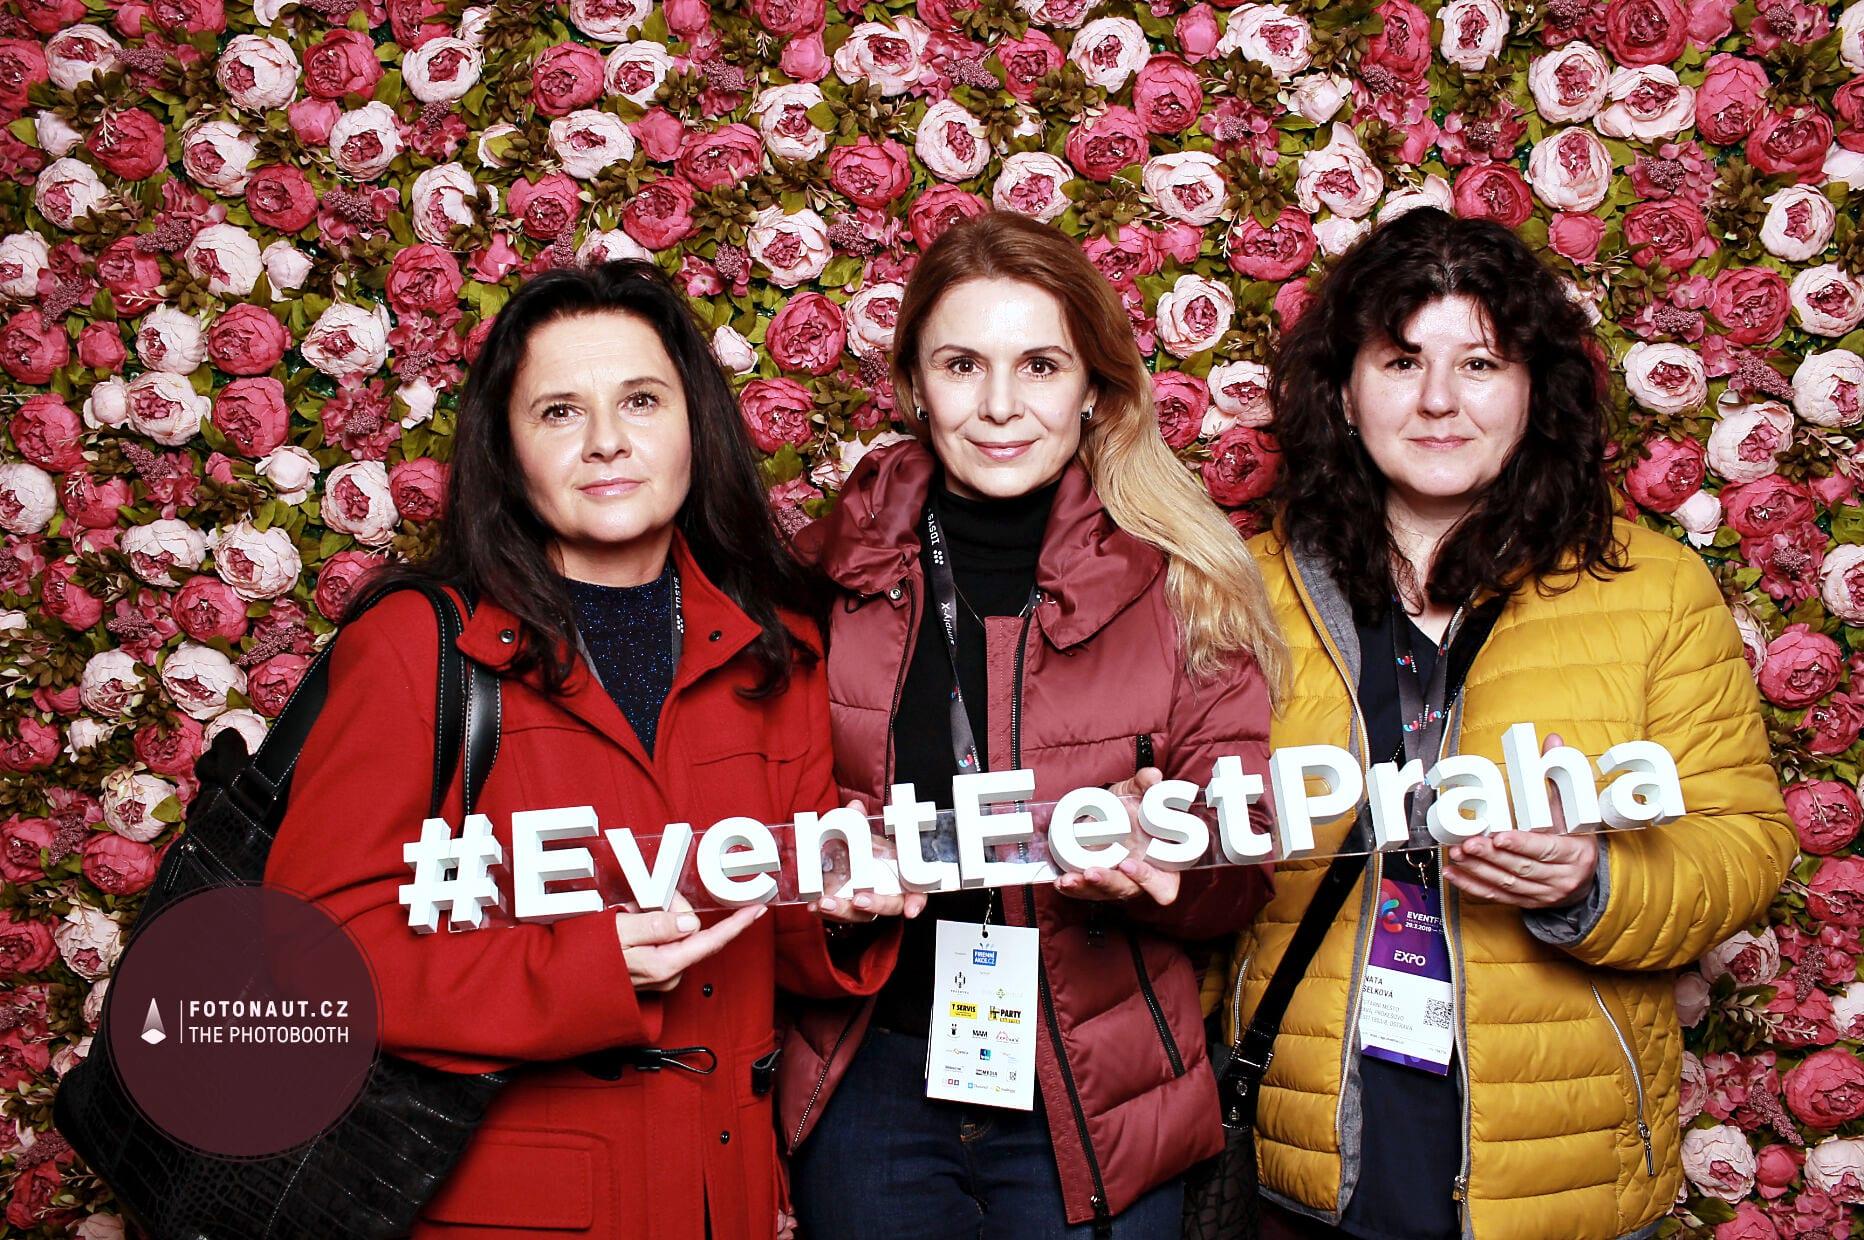 fotokoutek-event-fest-29-3-2019-591773